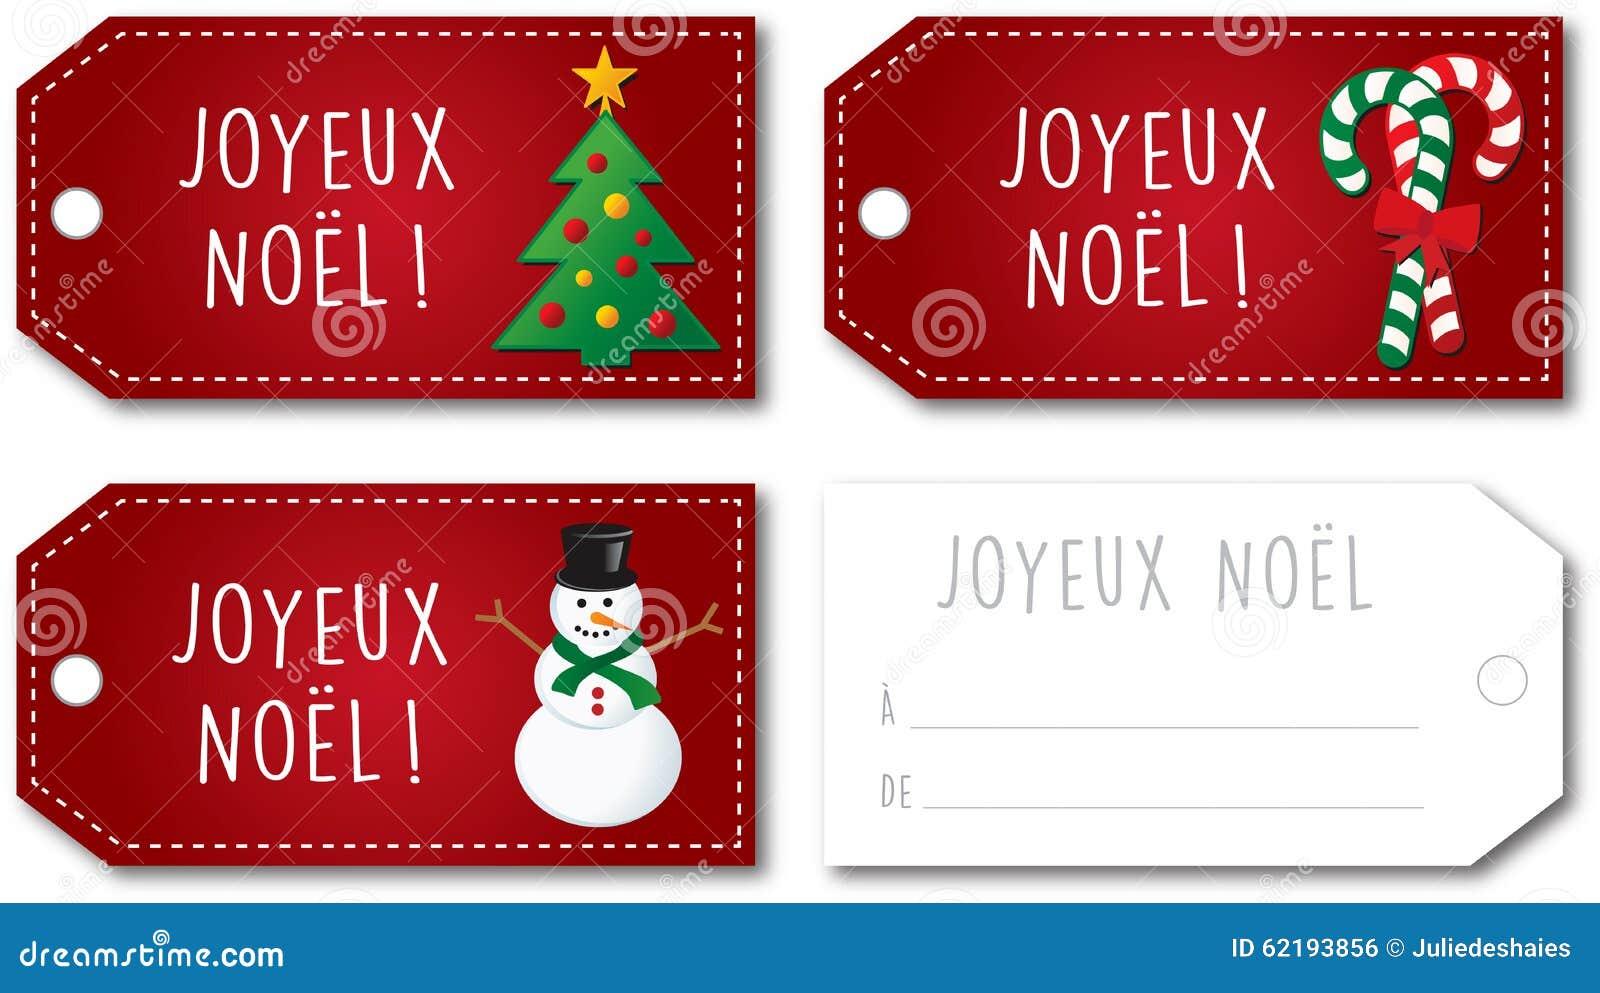 French Christmas Gift Tag Set Stock Illustration - Image: 62193856